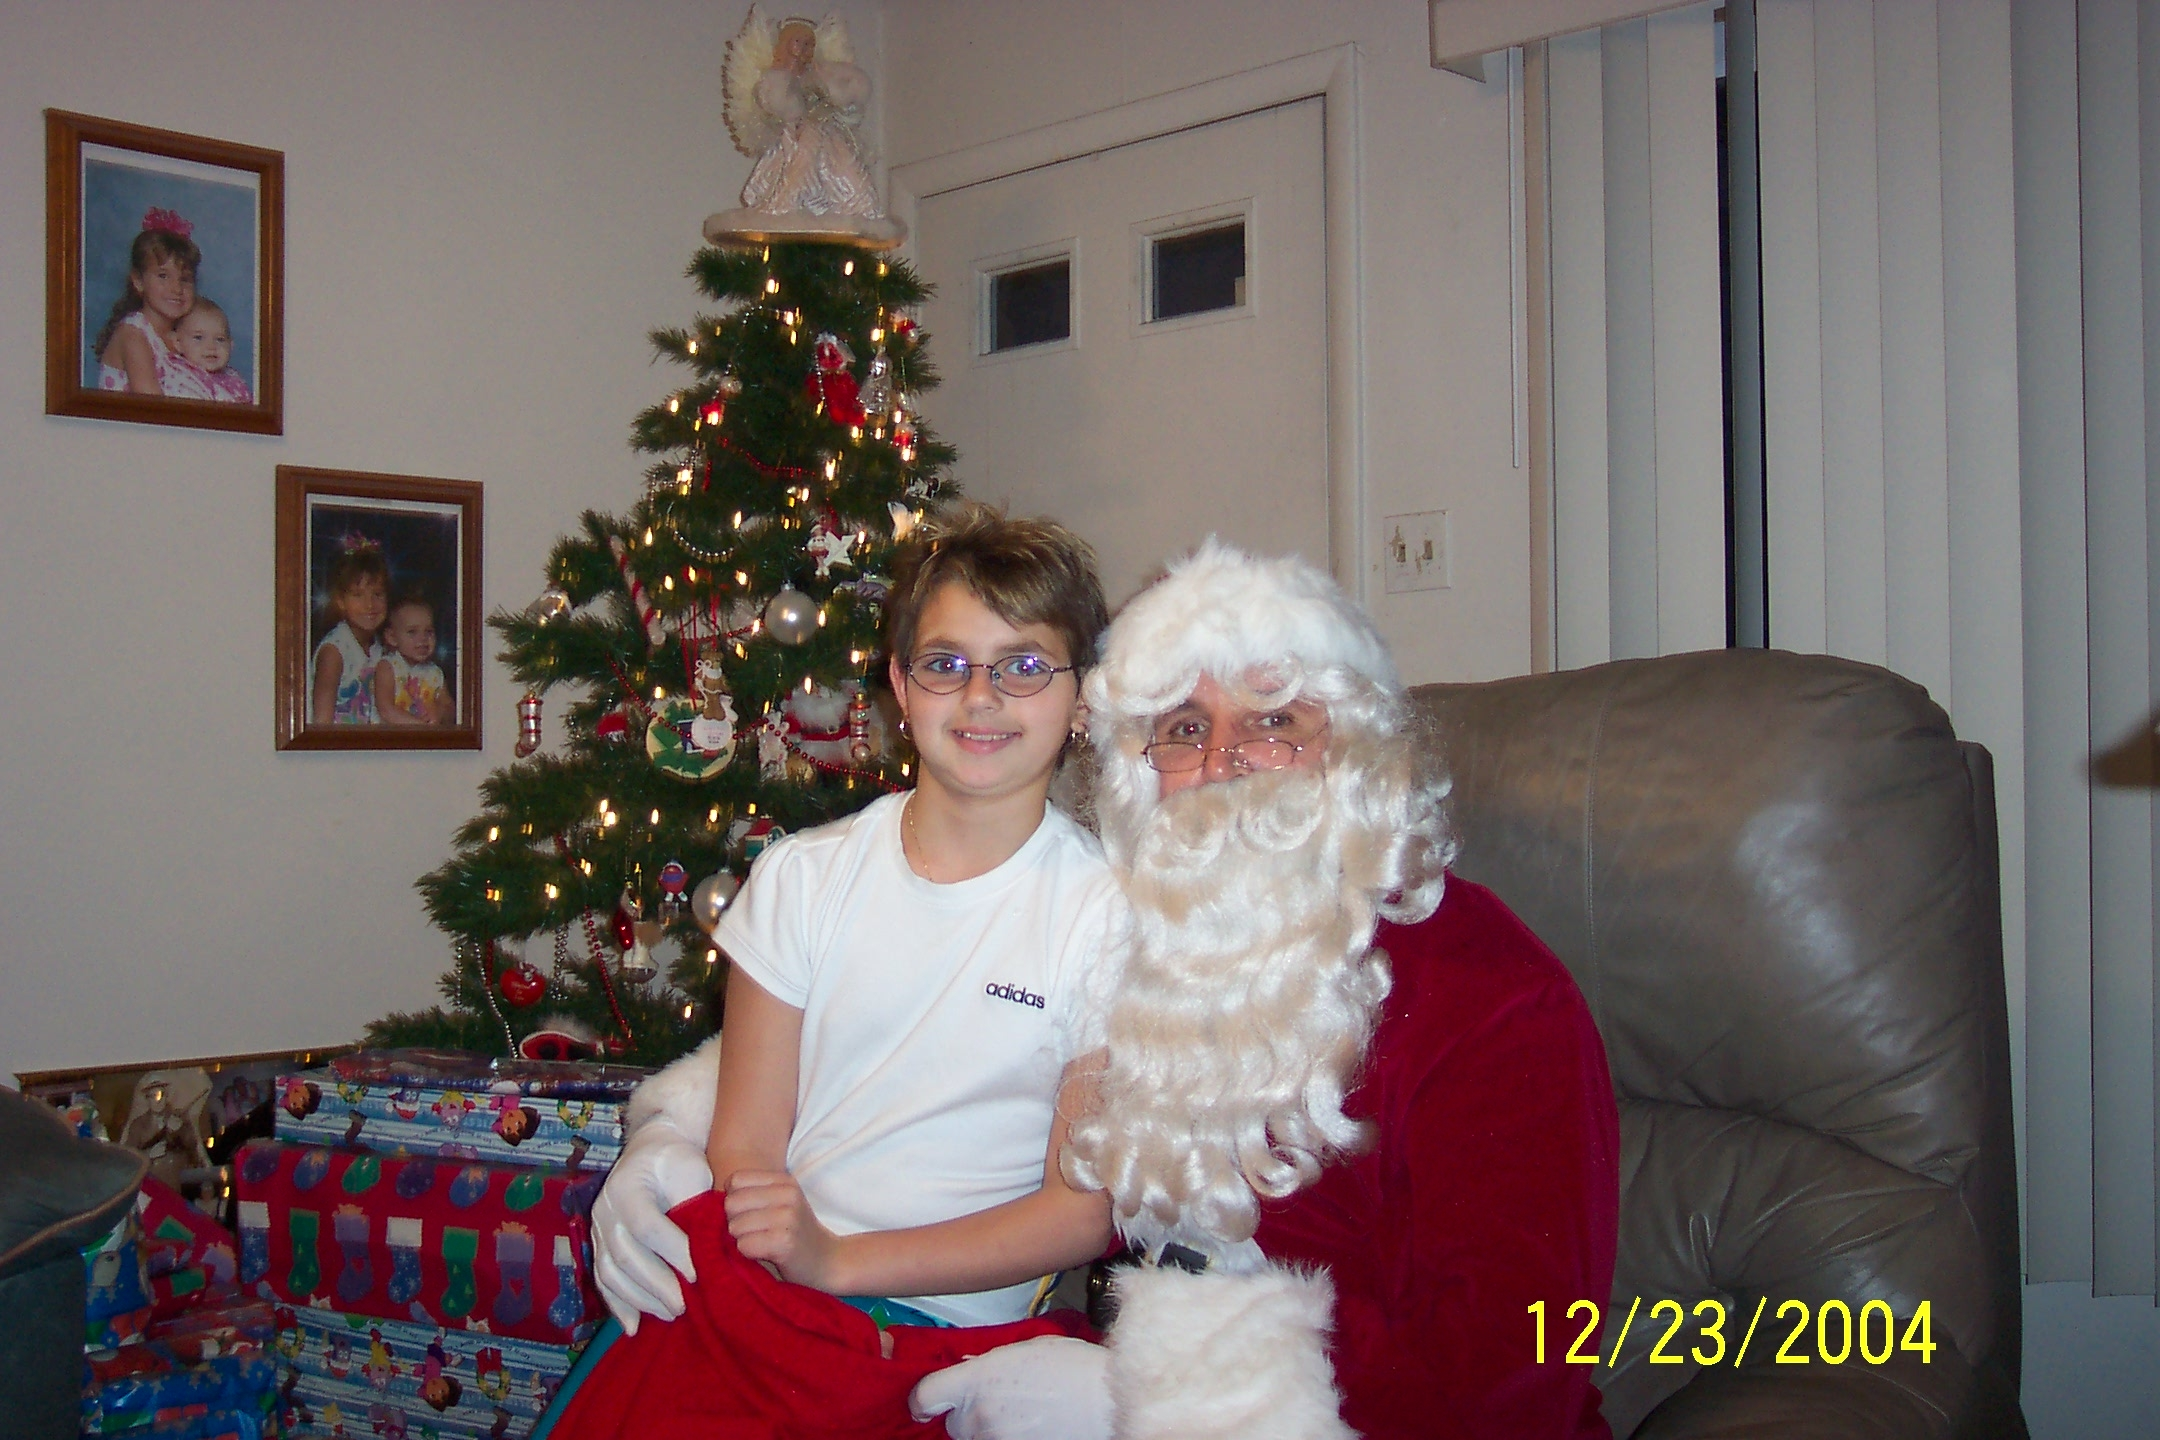 Alex home visited by Santa 2004